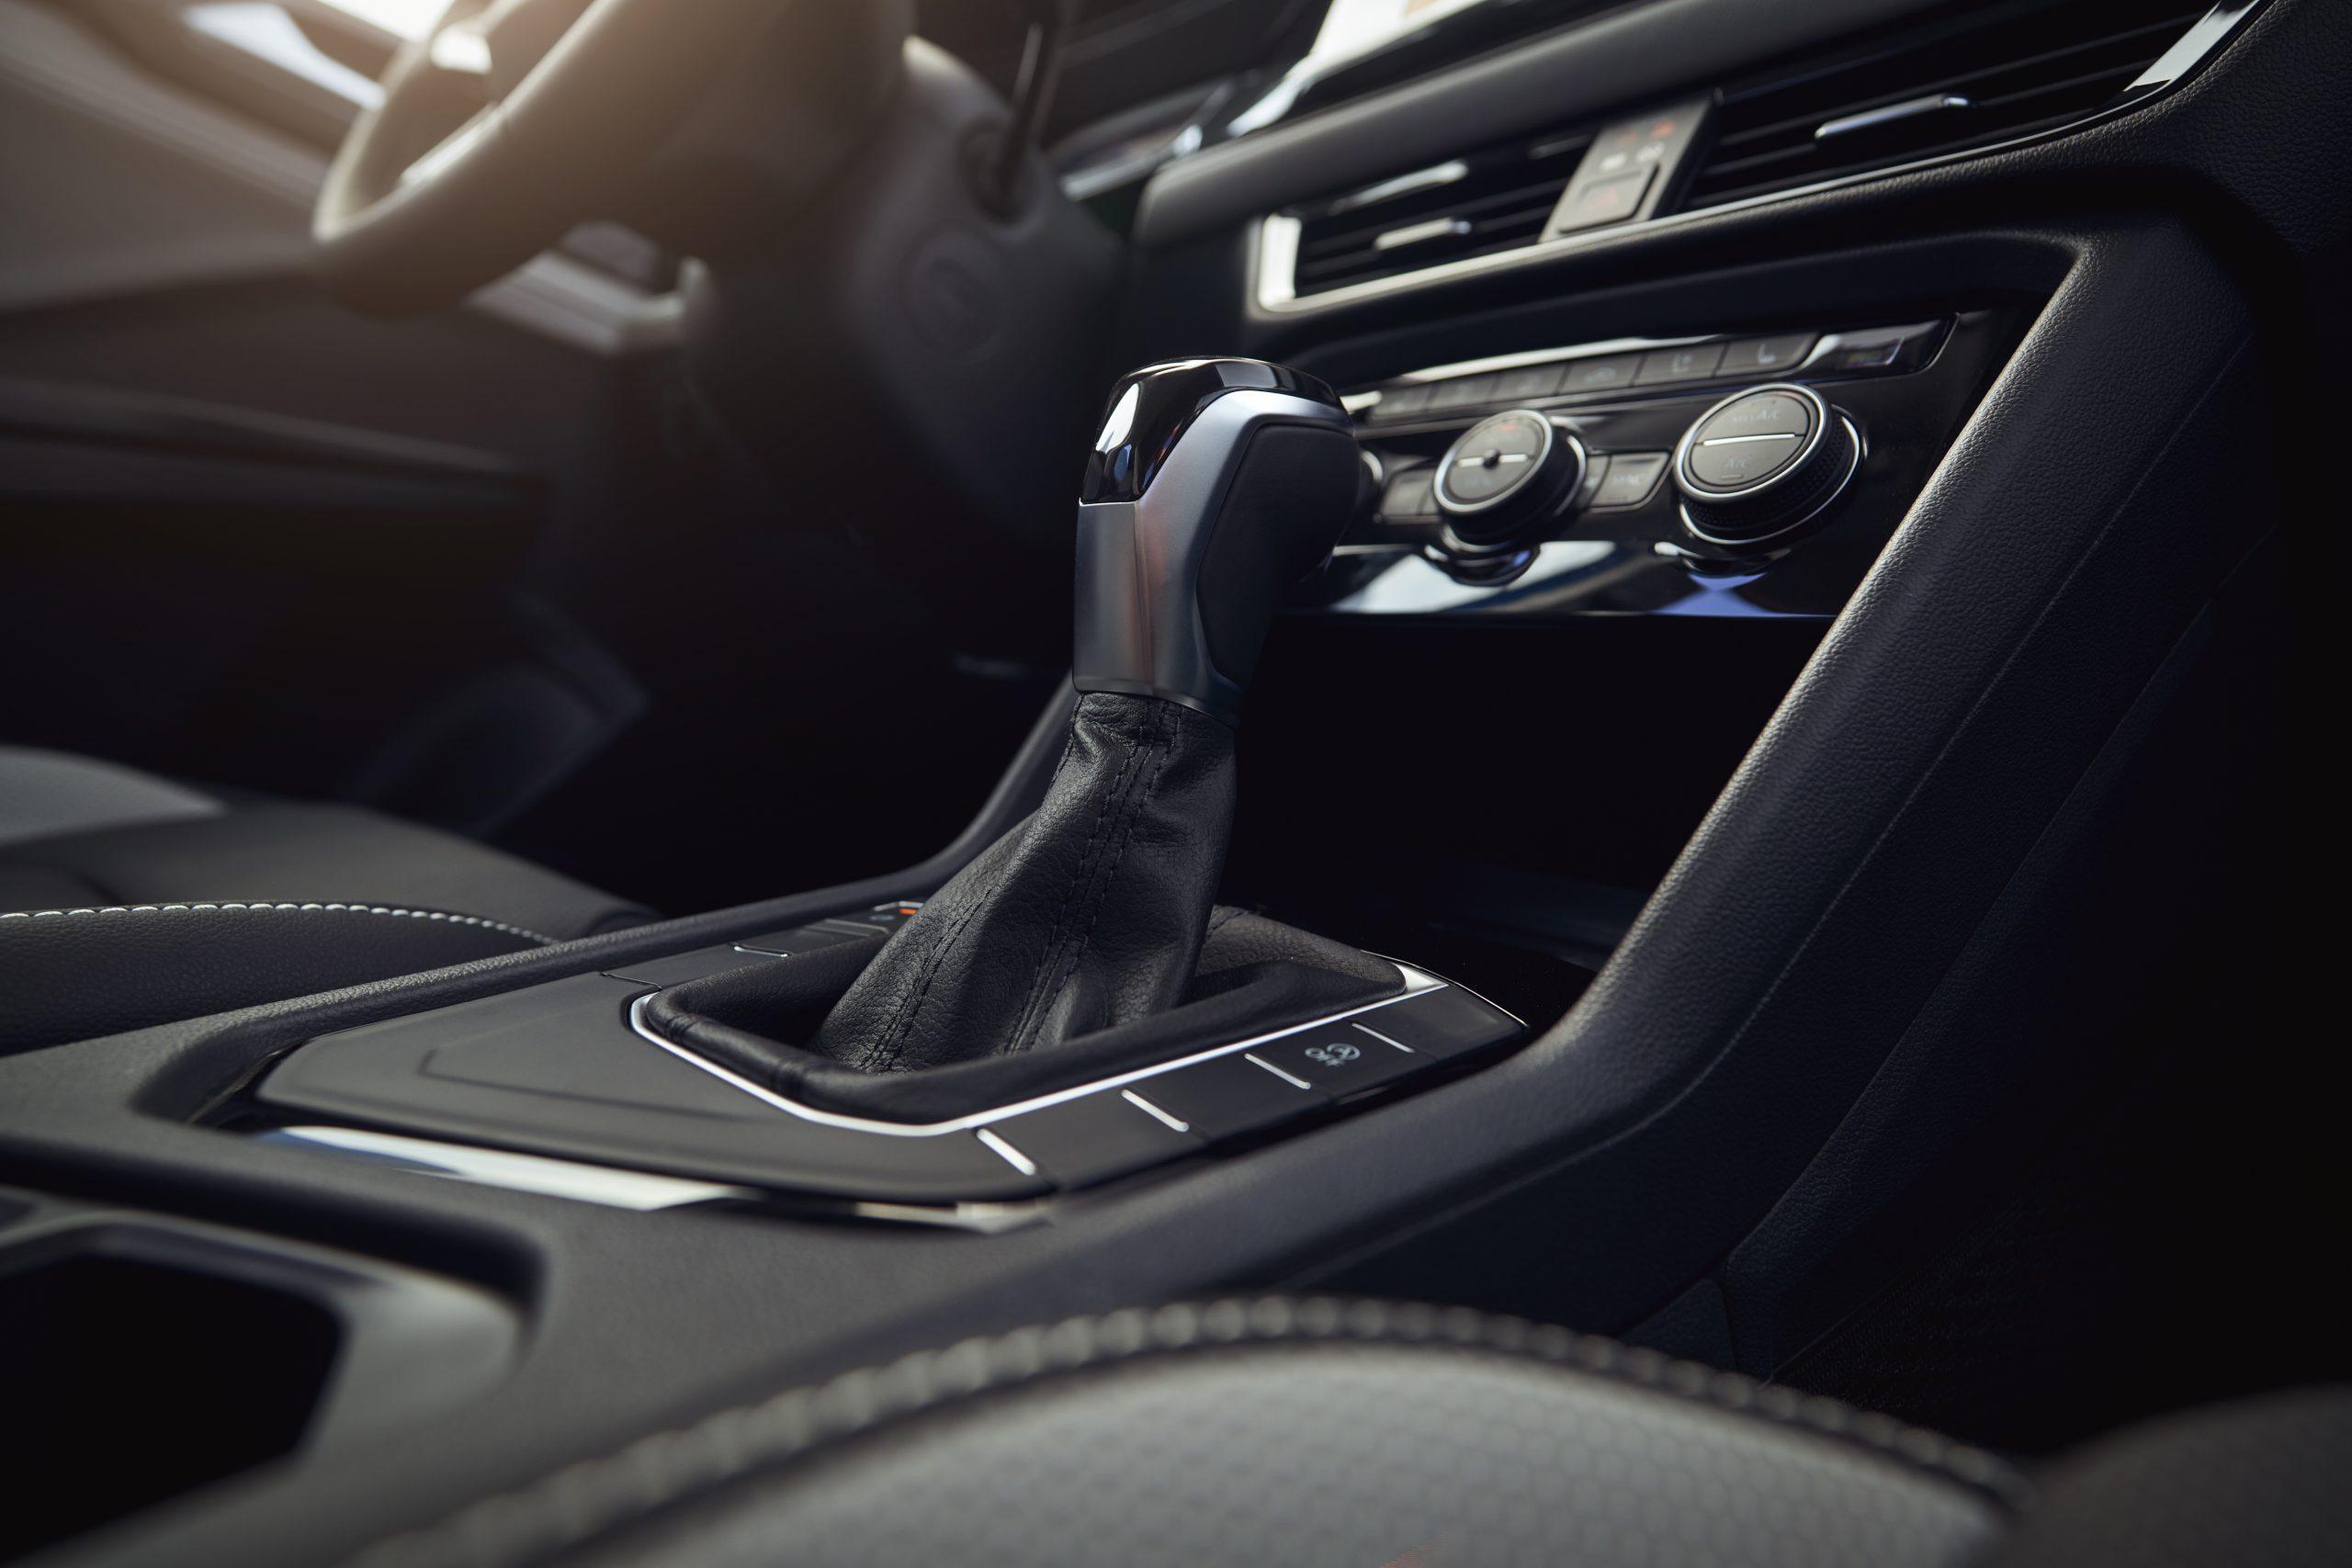 2022 Volkswagen Taos interior center console shifter